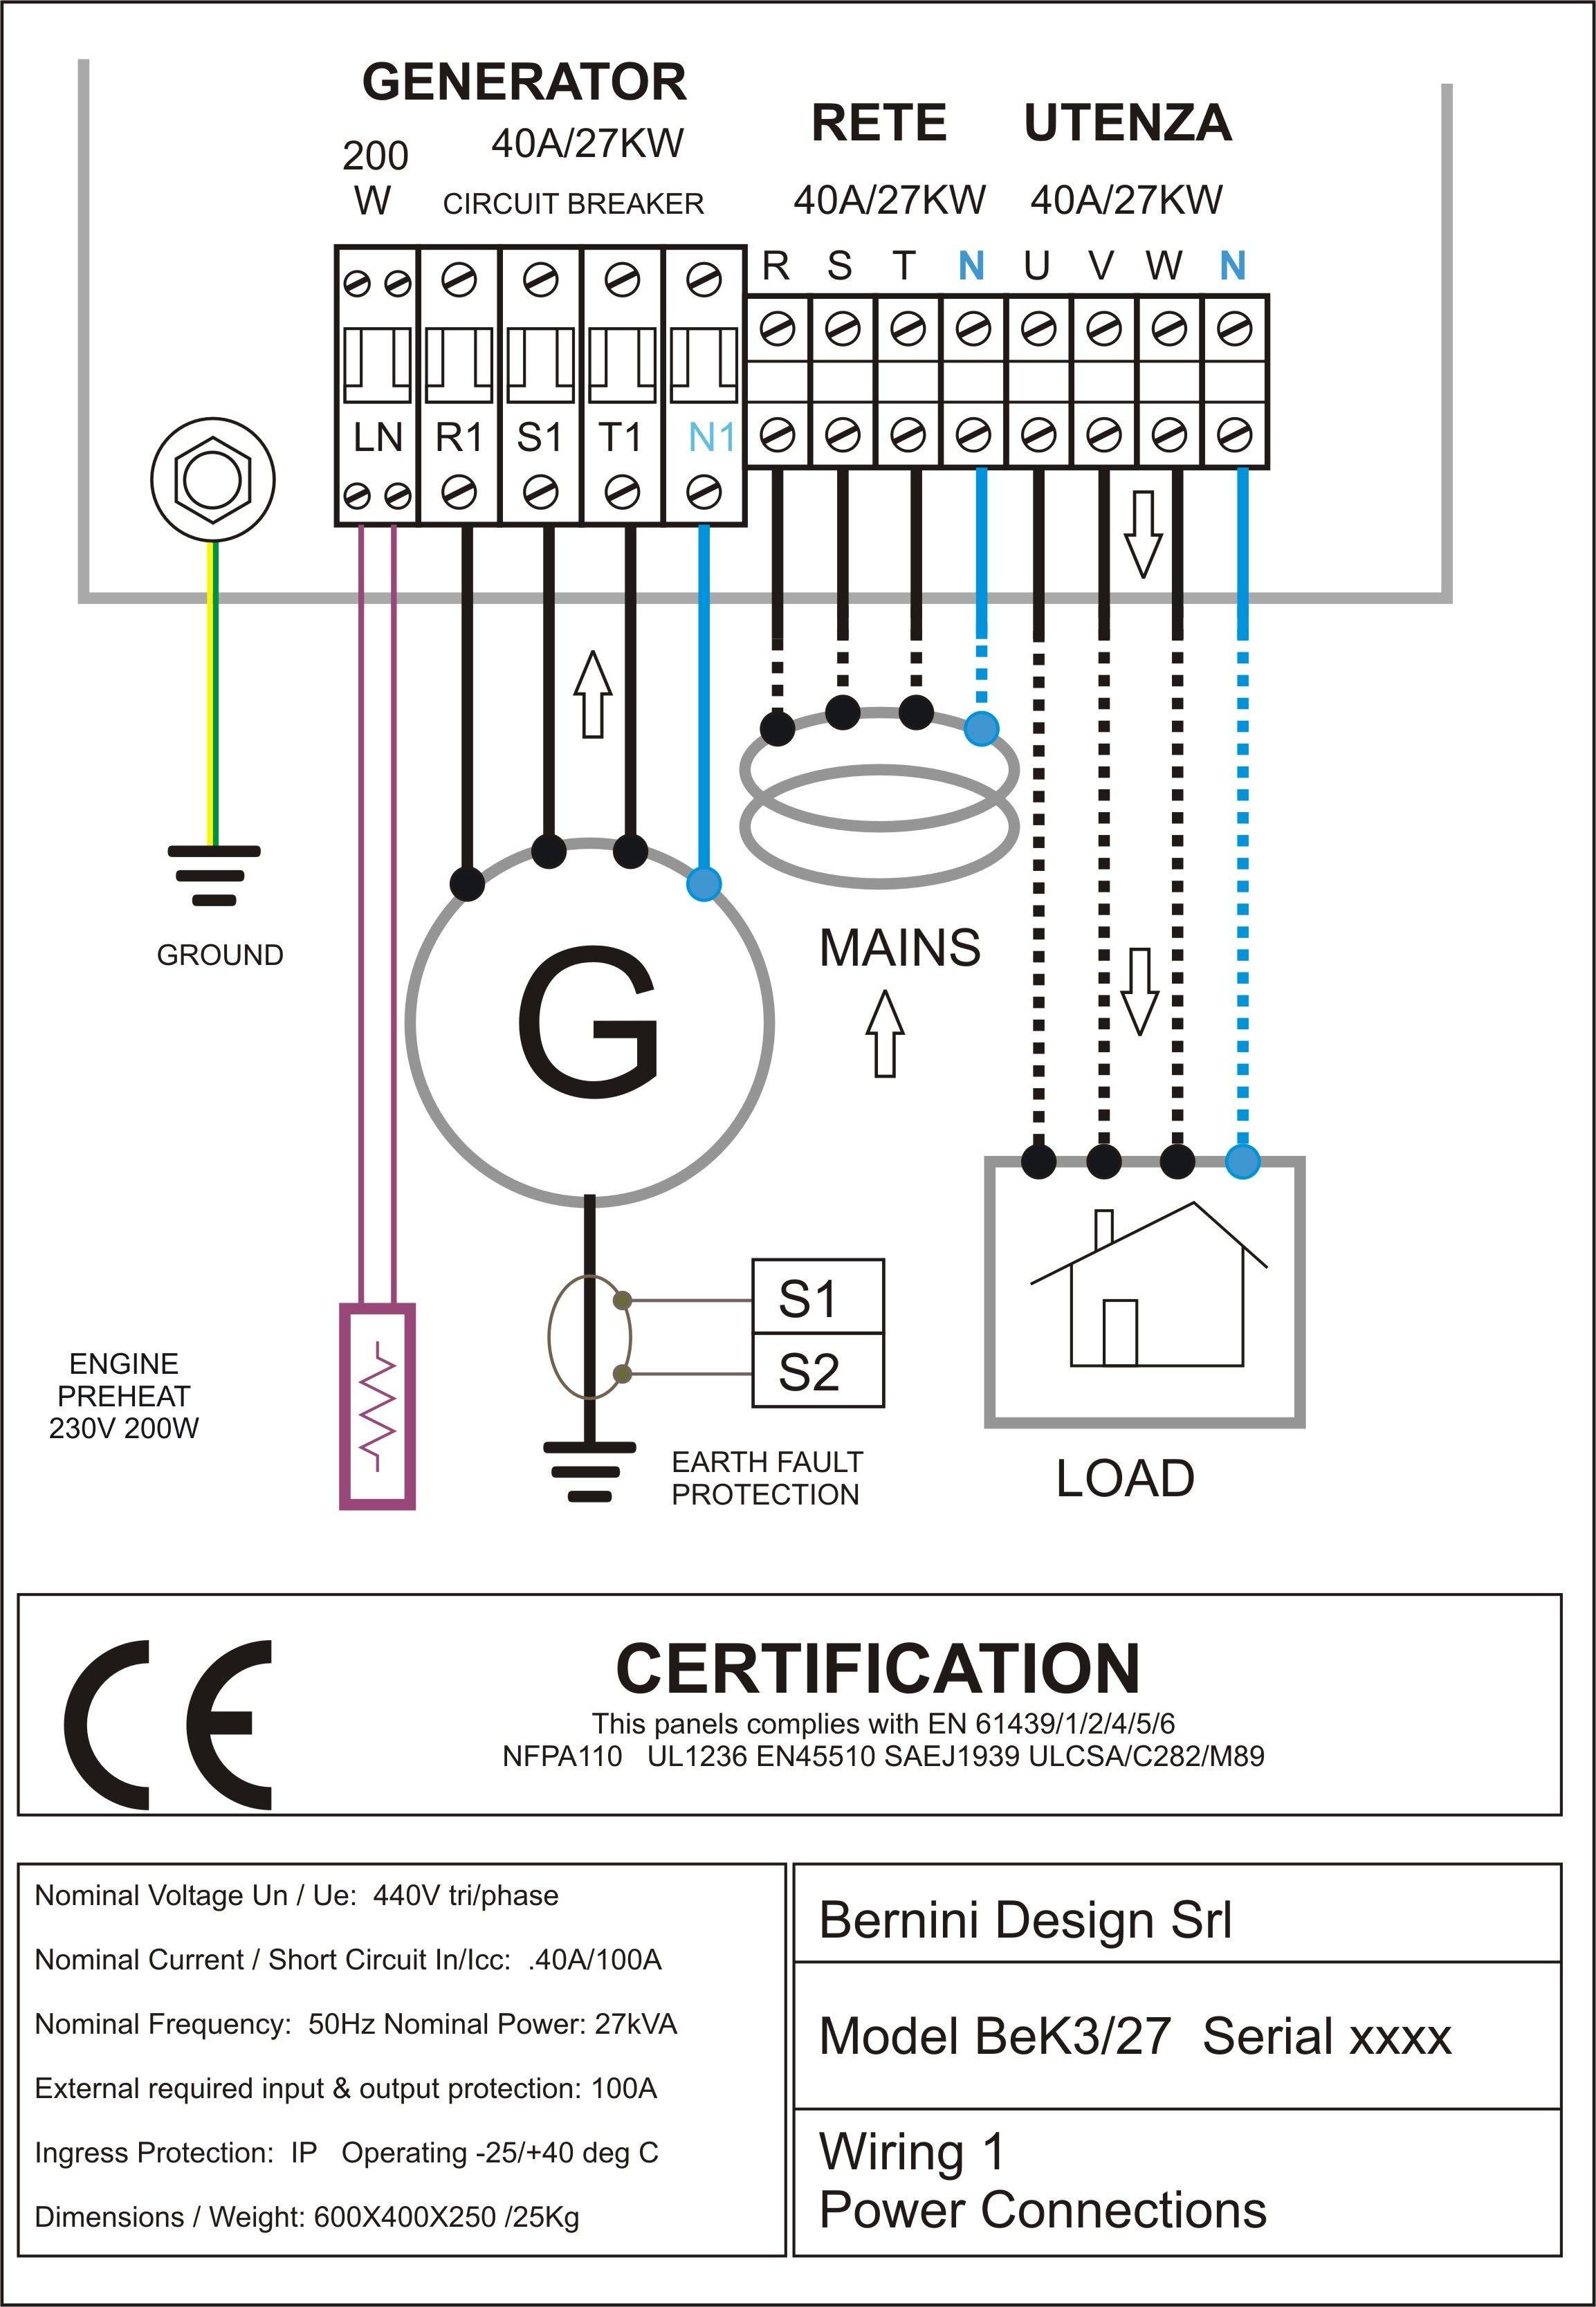 Race Car Switch Panel Wiring Diagram Sel Generator Control Panel Wiring Diagram Ac Connections Of Race Car Switch Panel Wiring Diagram